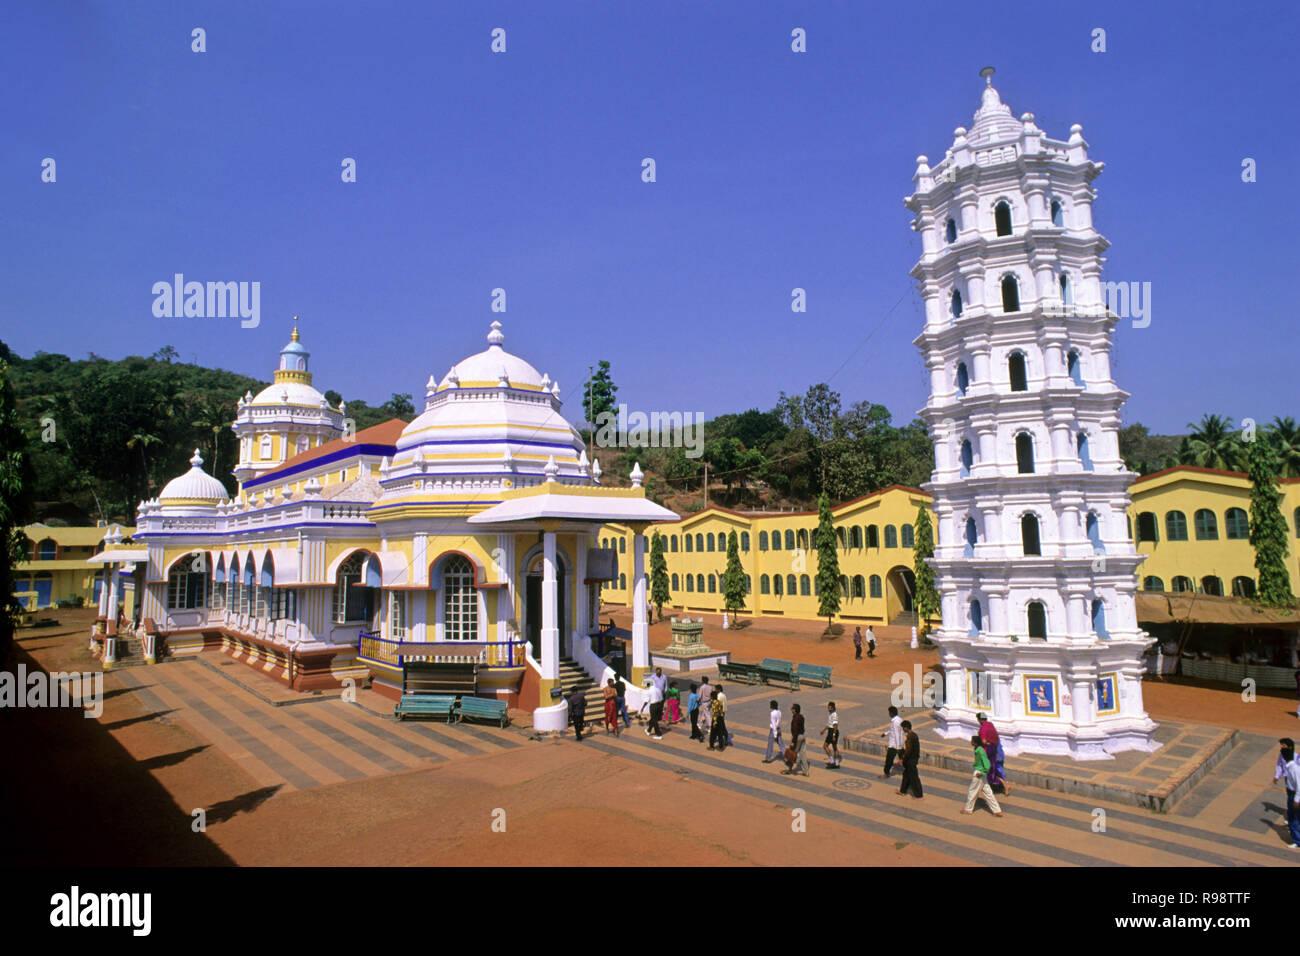 Shri Mangesh Temple, Ponda, Goa, Maharashtra, Inde Banque D'Images